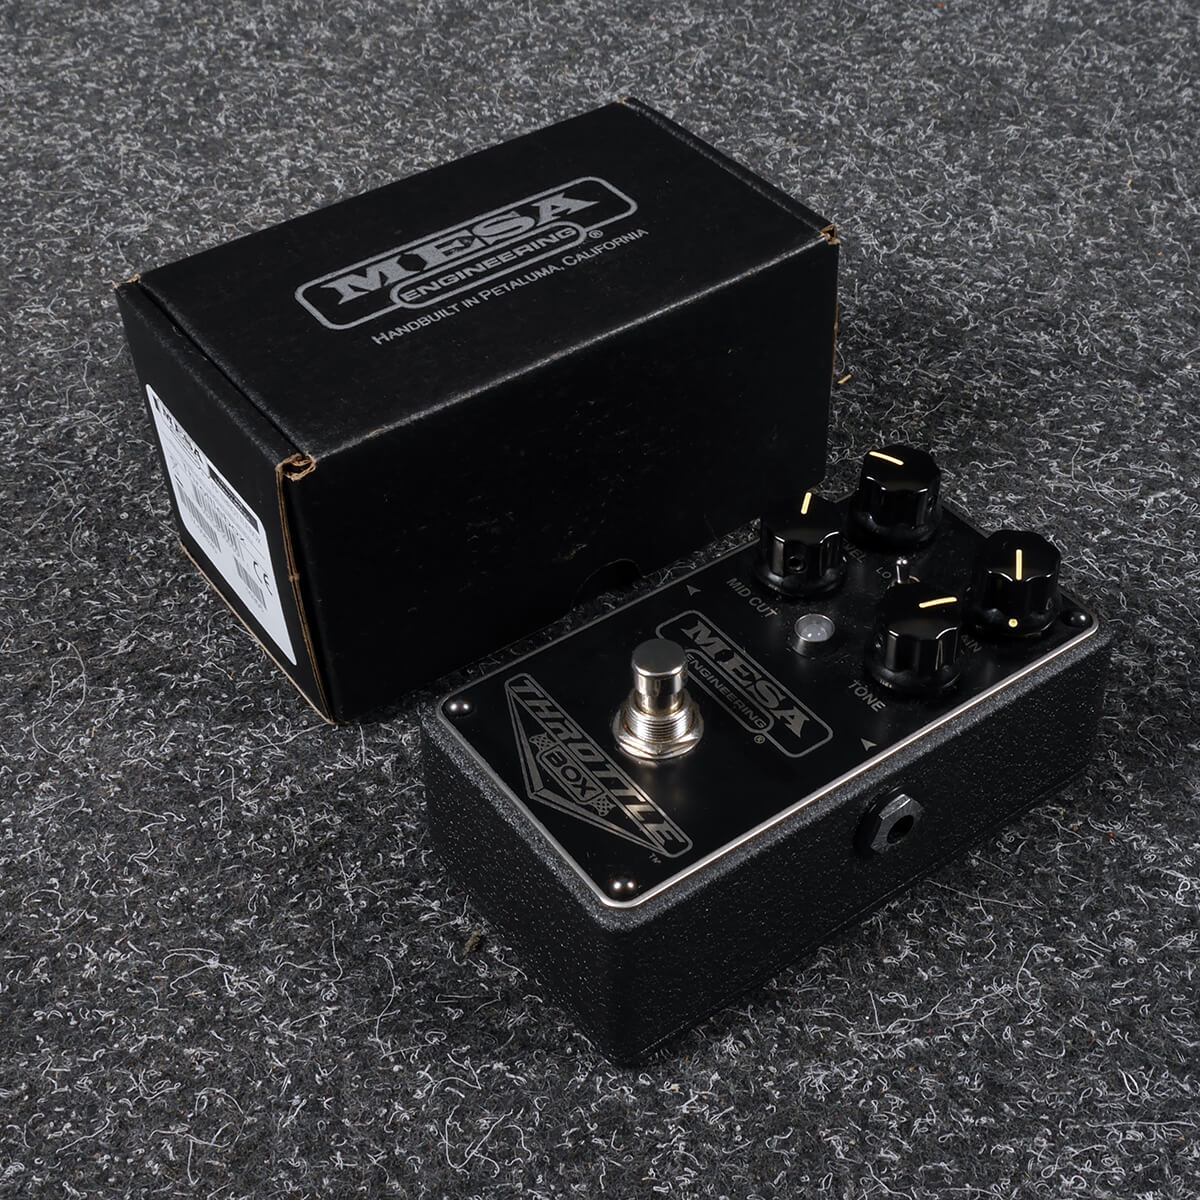 Mesa Boogie Throttle Box Distortion FX Pedal w/Box - 2nd Hand